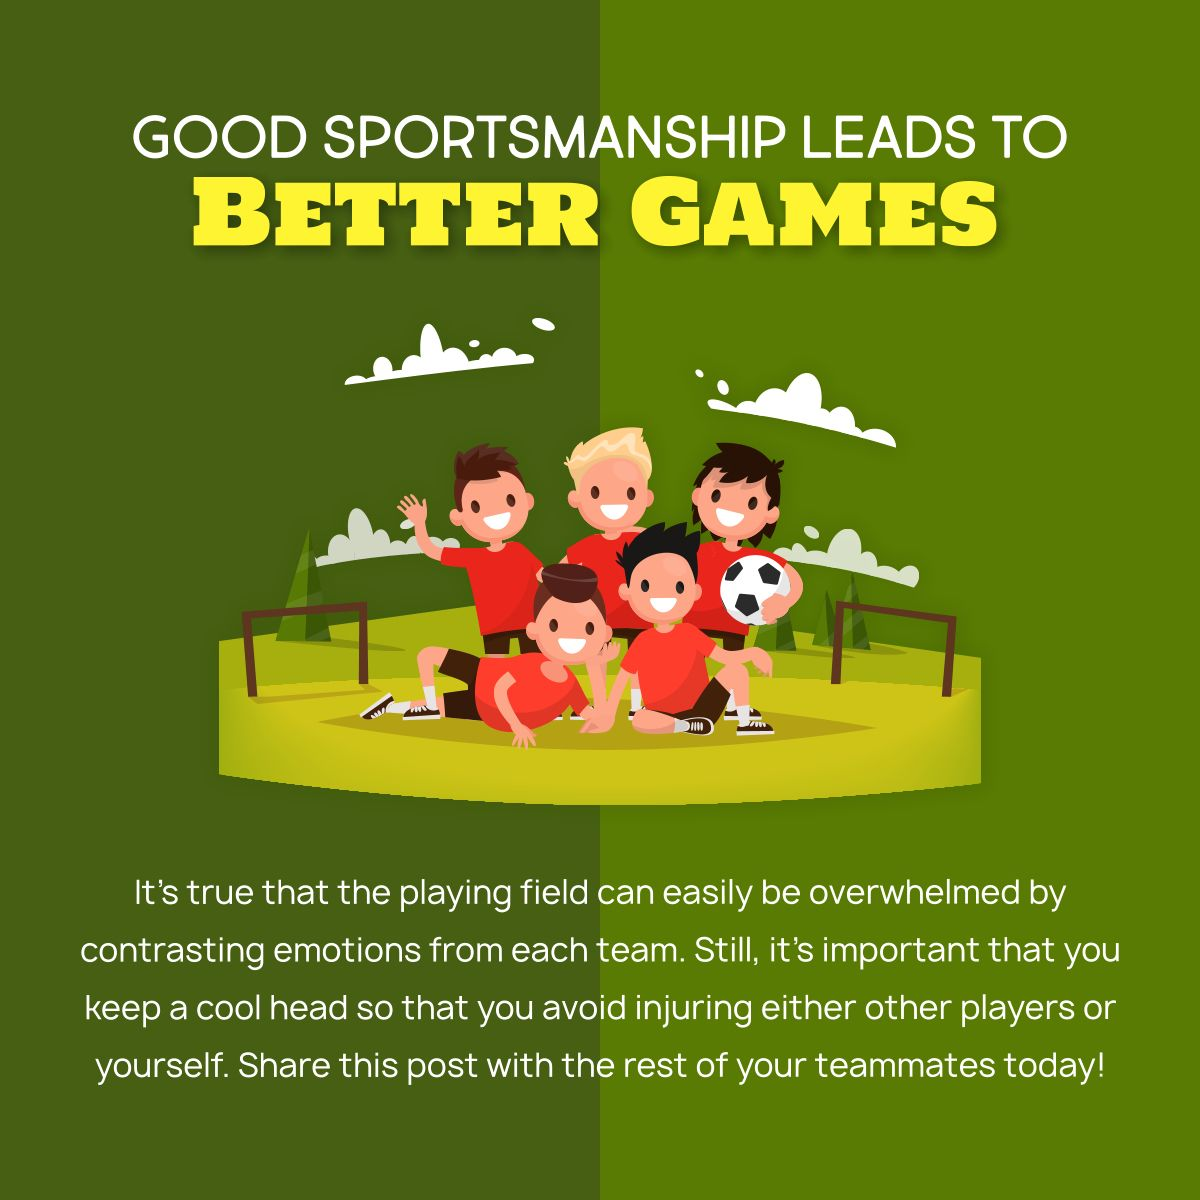 Good Sportsmanship Leads to Better Games Sportsmanship